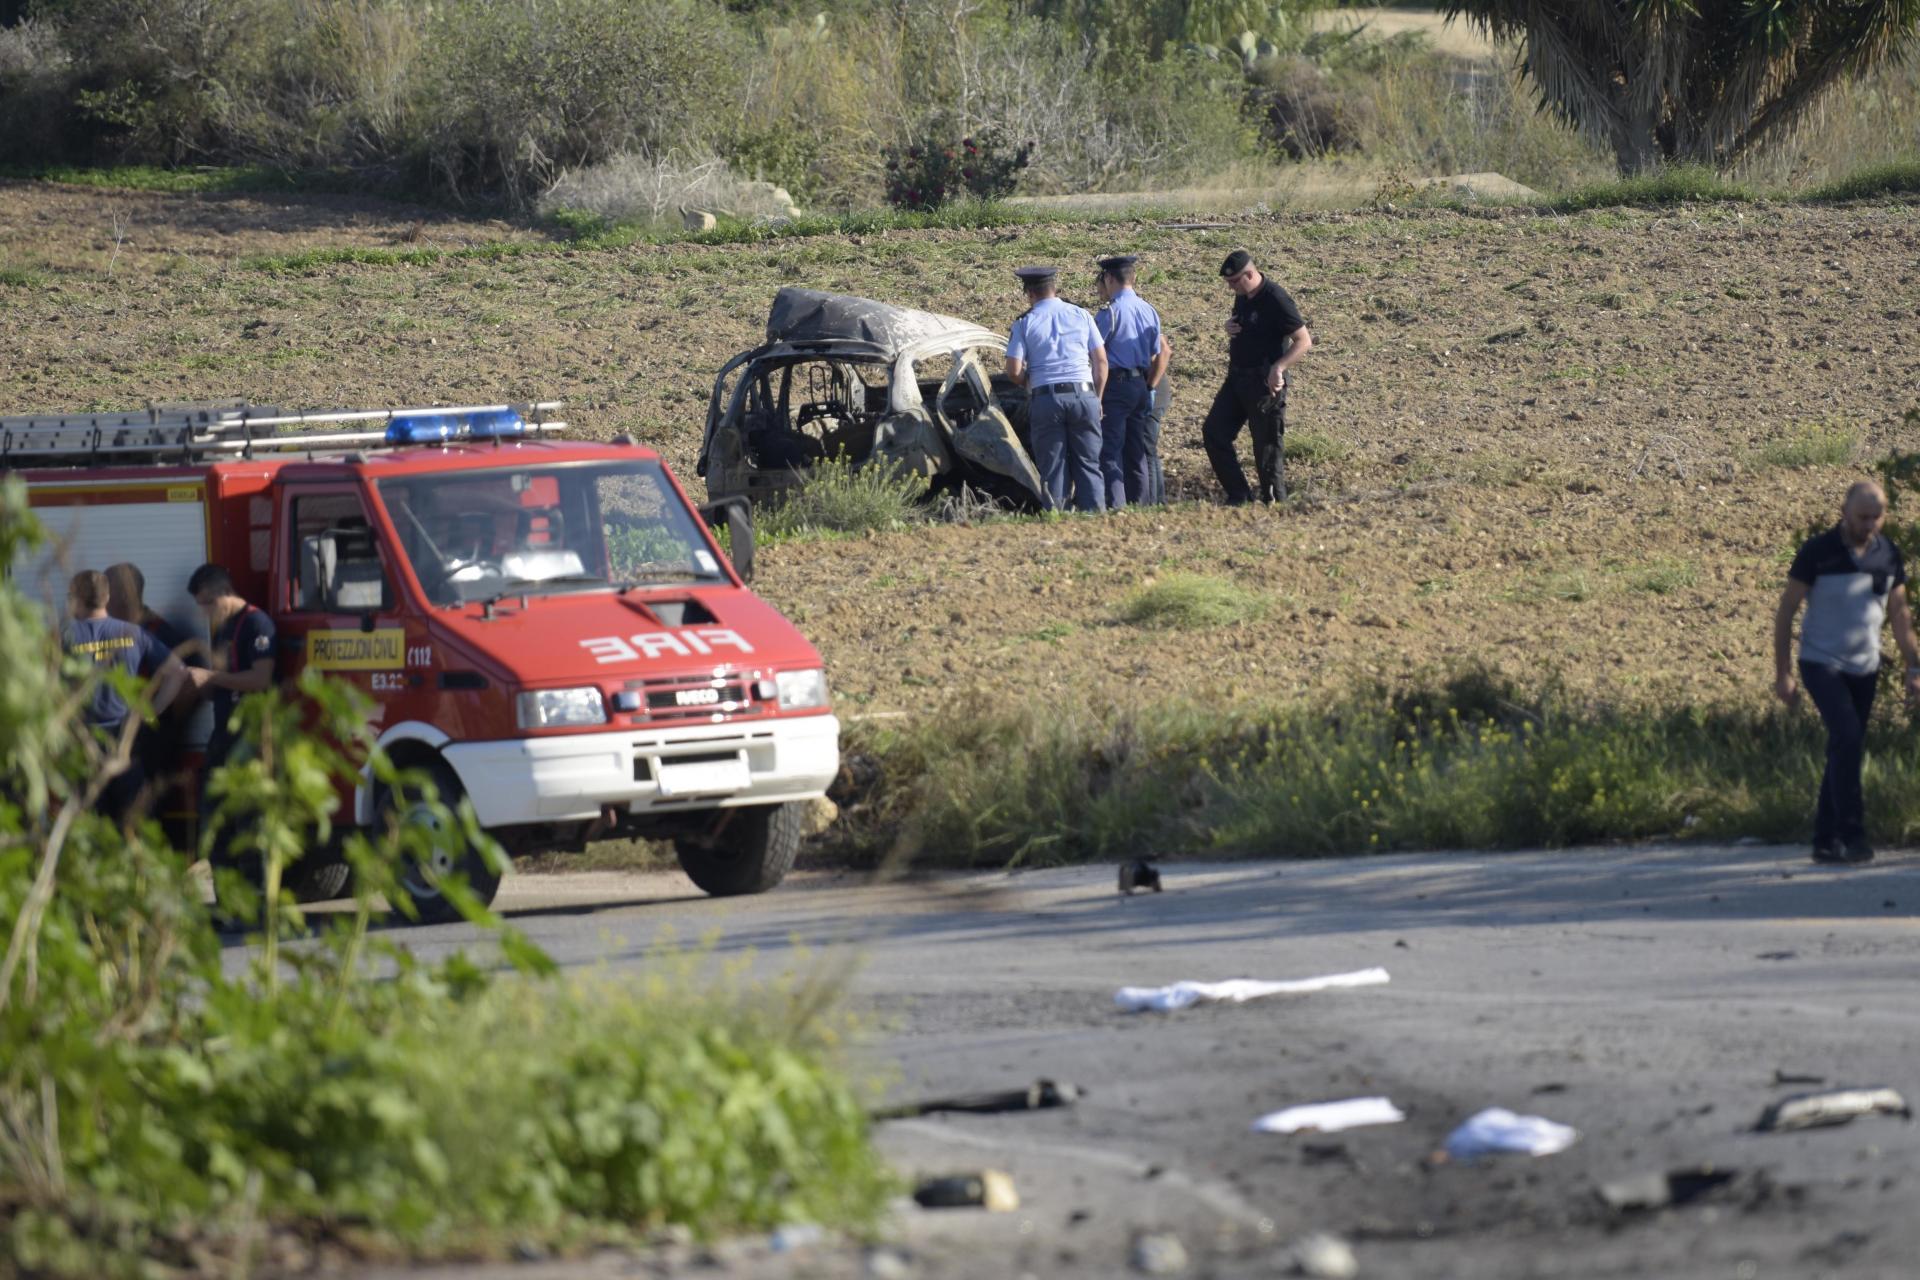 Daphne Caruana Galizia was killed by a car bomb outside her home in October 2017. Photo: Mark Zammit Cordina